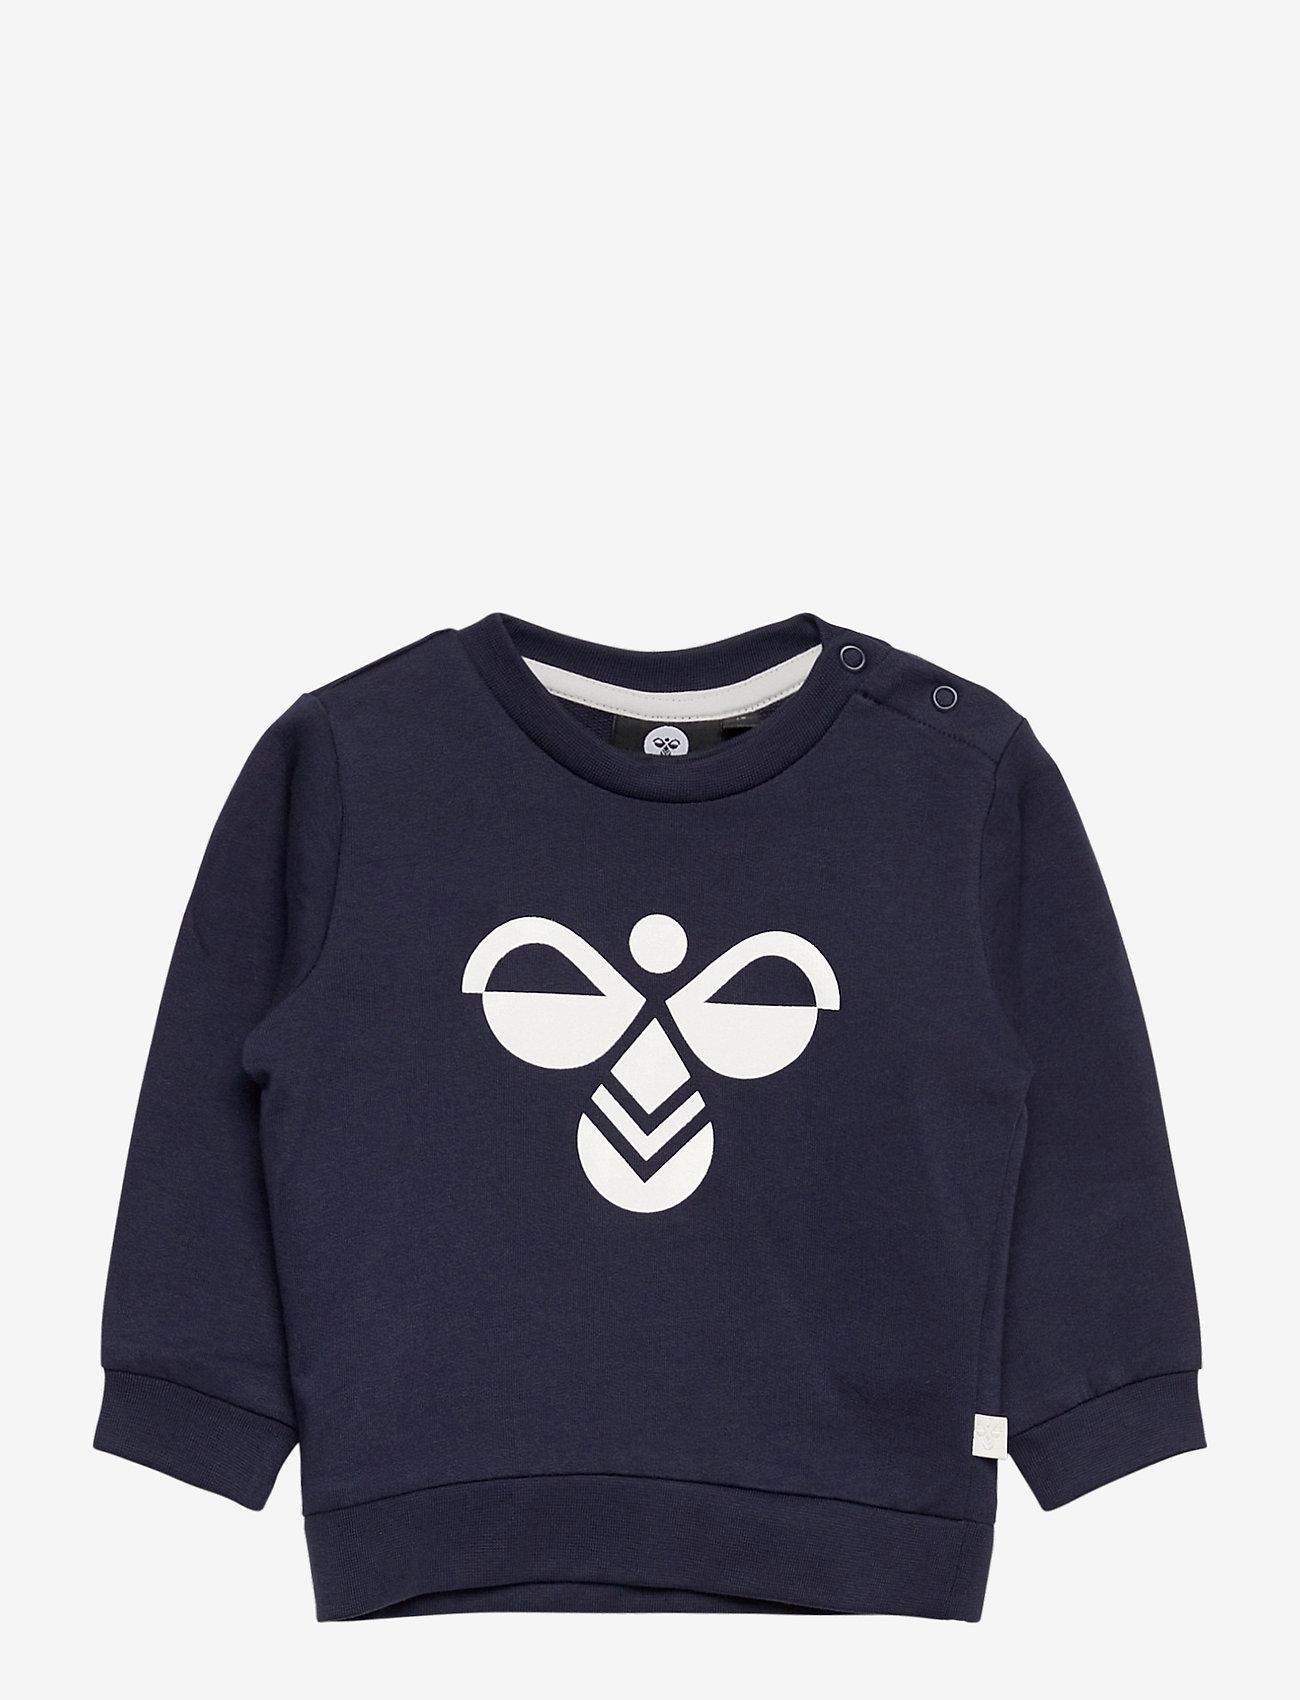 Hummel - hmlLEMON SWEATSHIRT - sweatshirts - black iris - 0